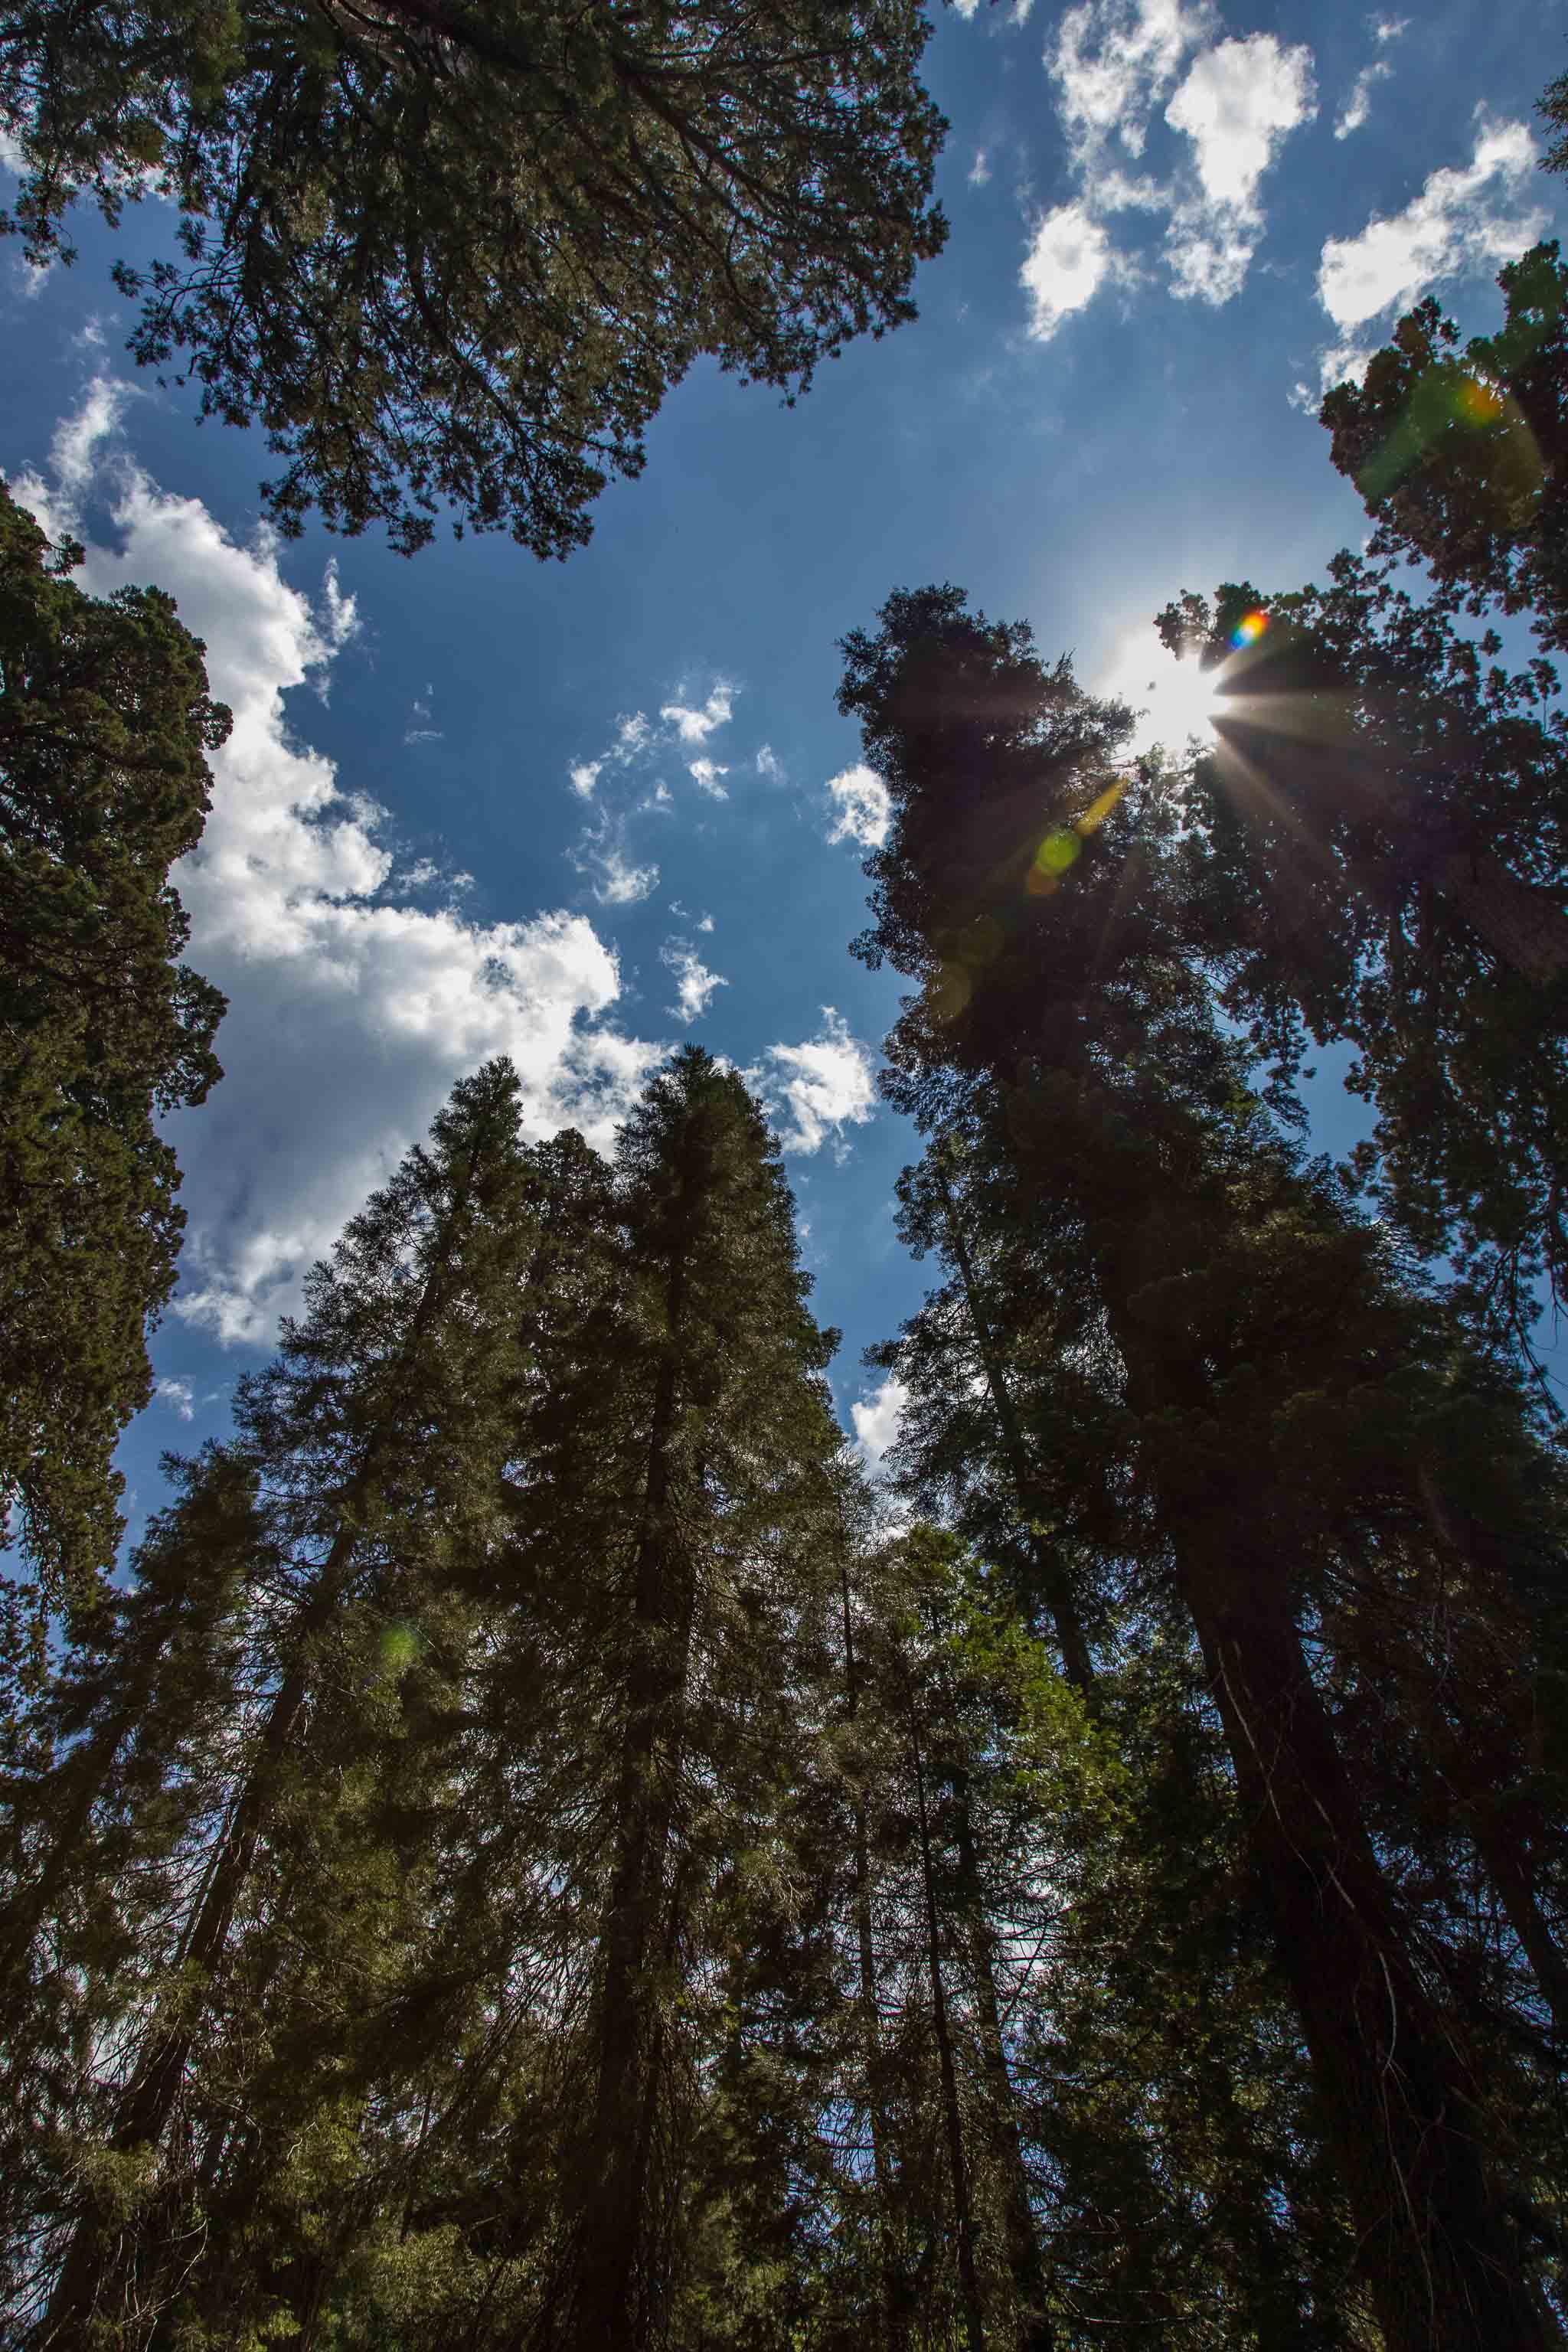 Towering Redwoods of Yosemite